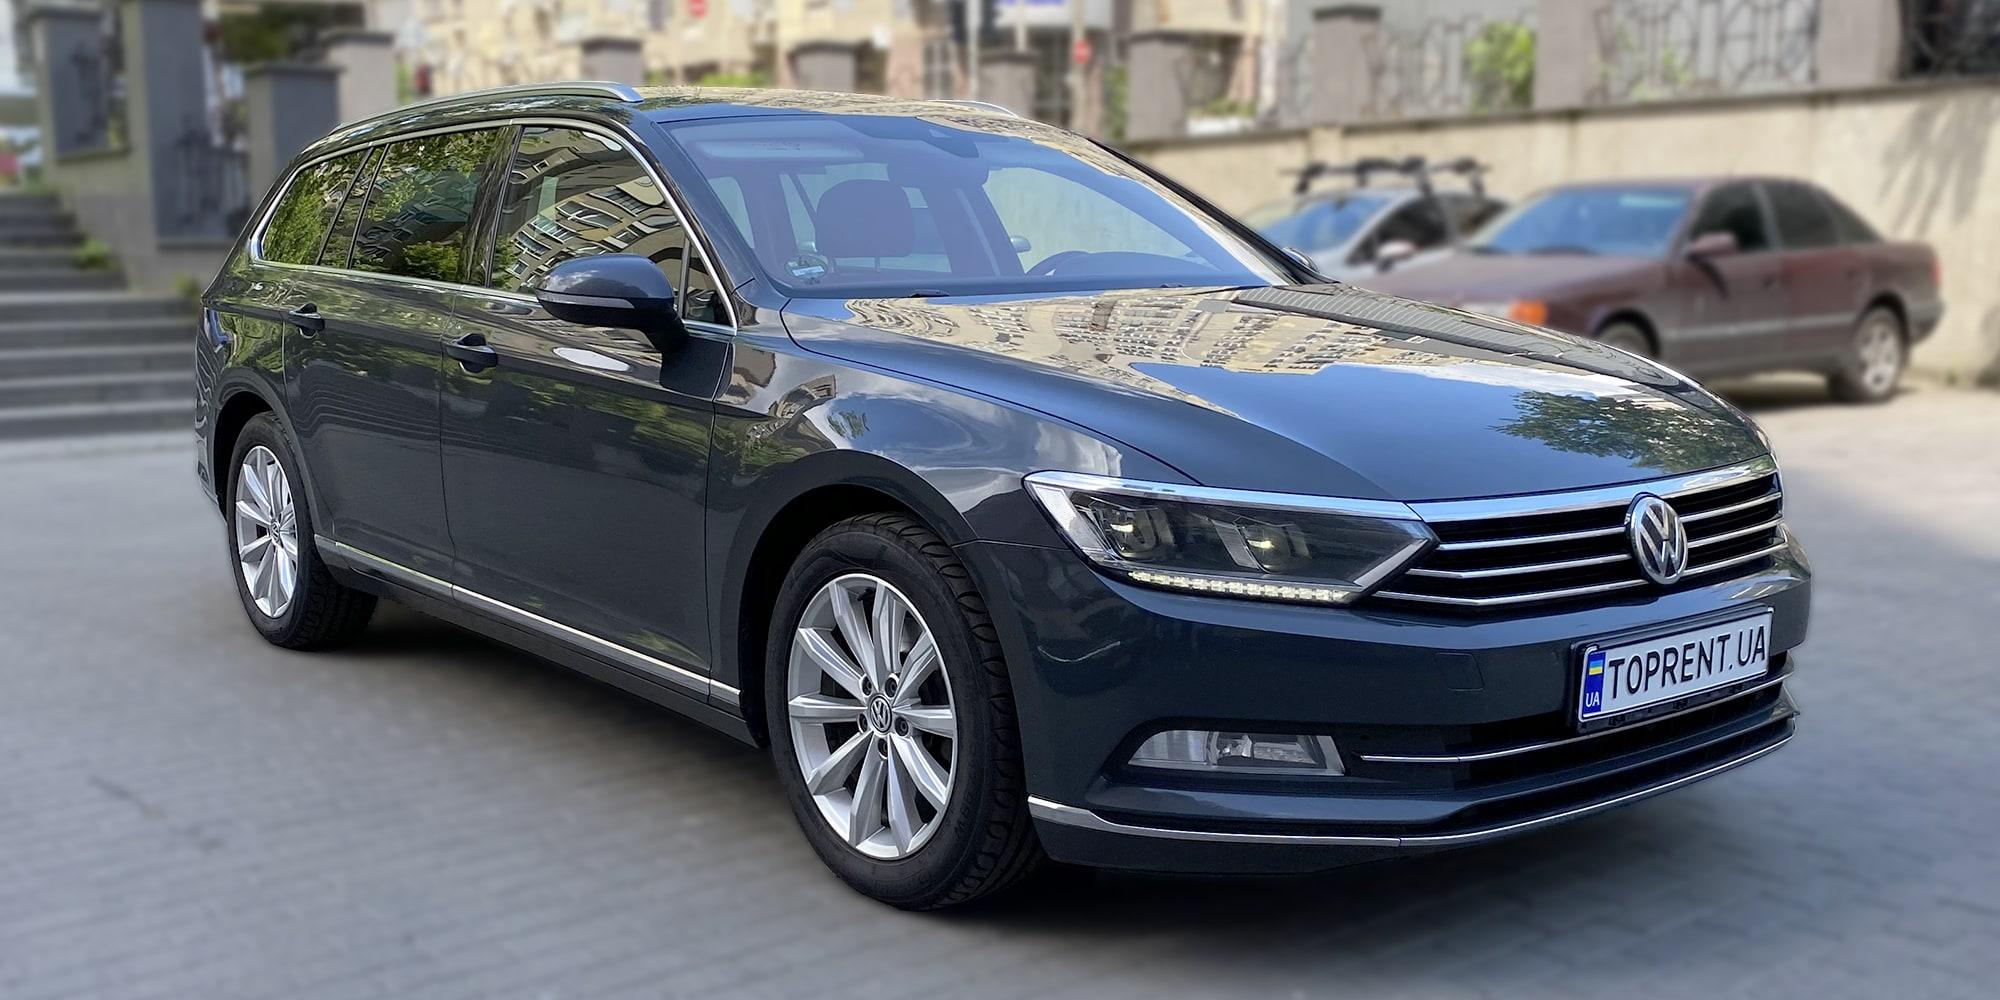 Прокат и аренда авто Volkswagen Passat B8 variant diesel - фото 2 | TOPrent.ua